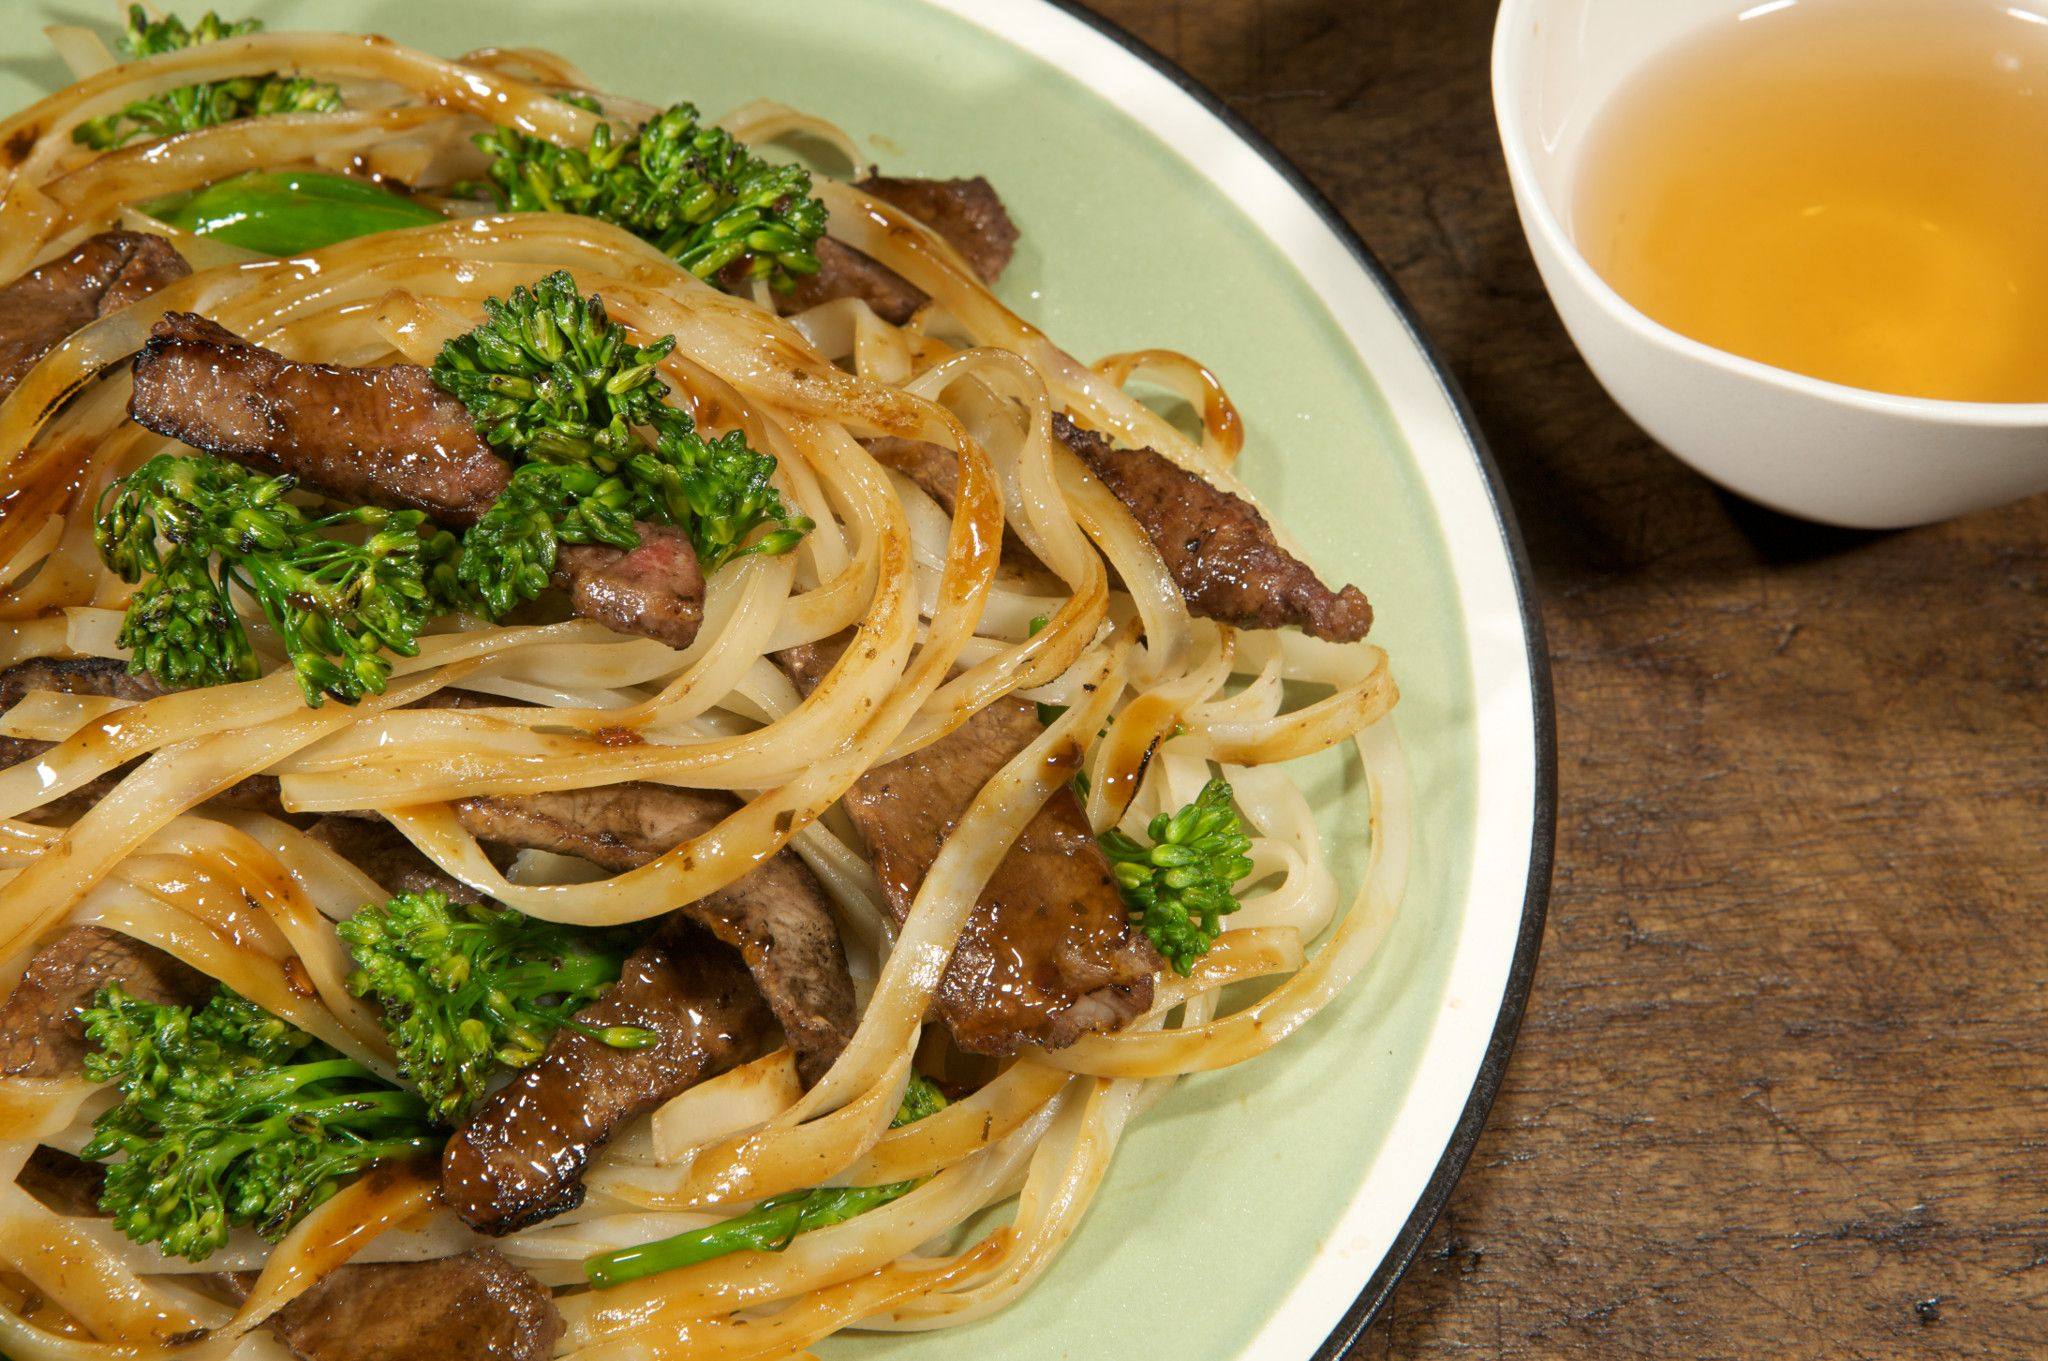 Spicy Shanghai Steak And Noodle Stir Fry